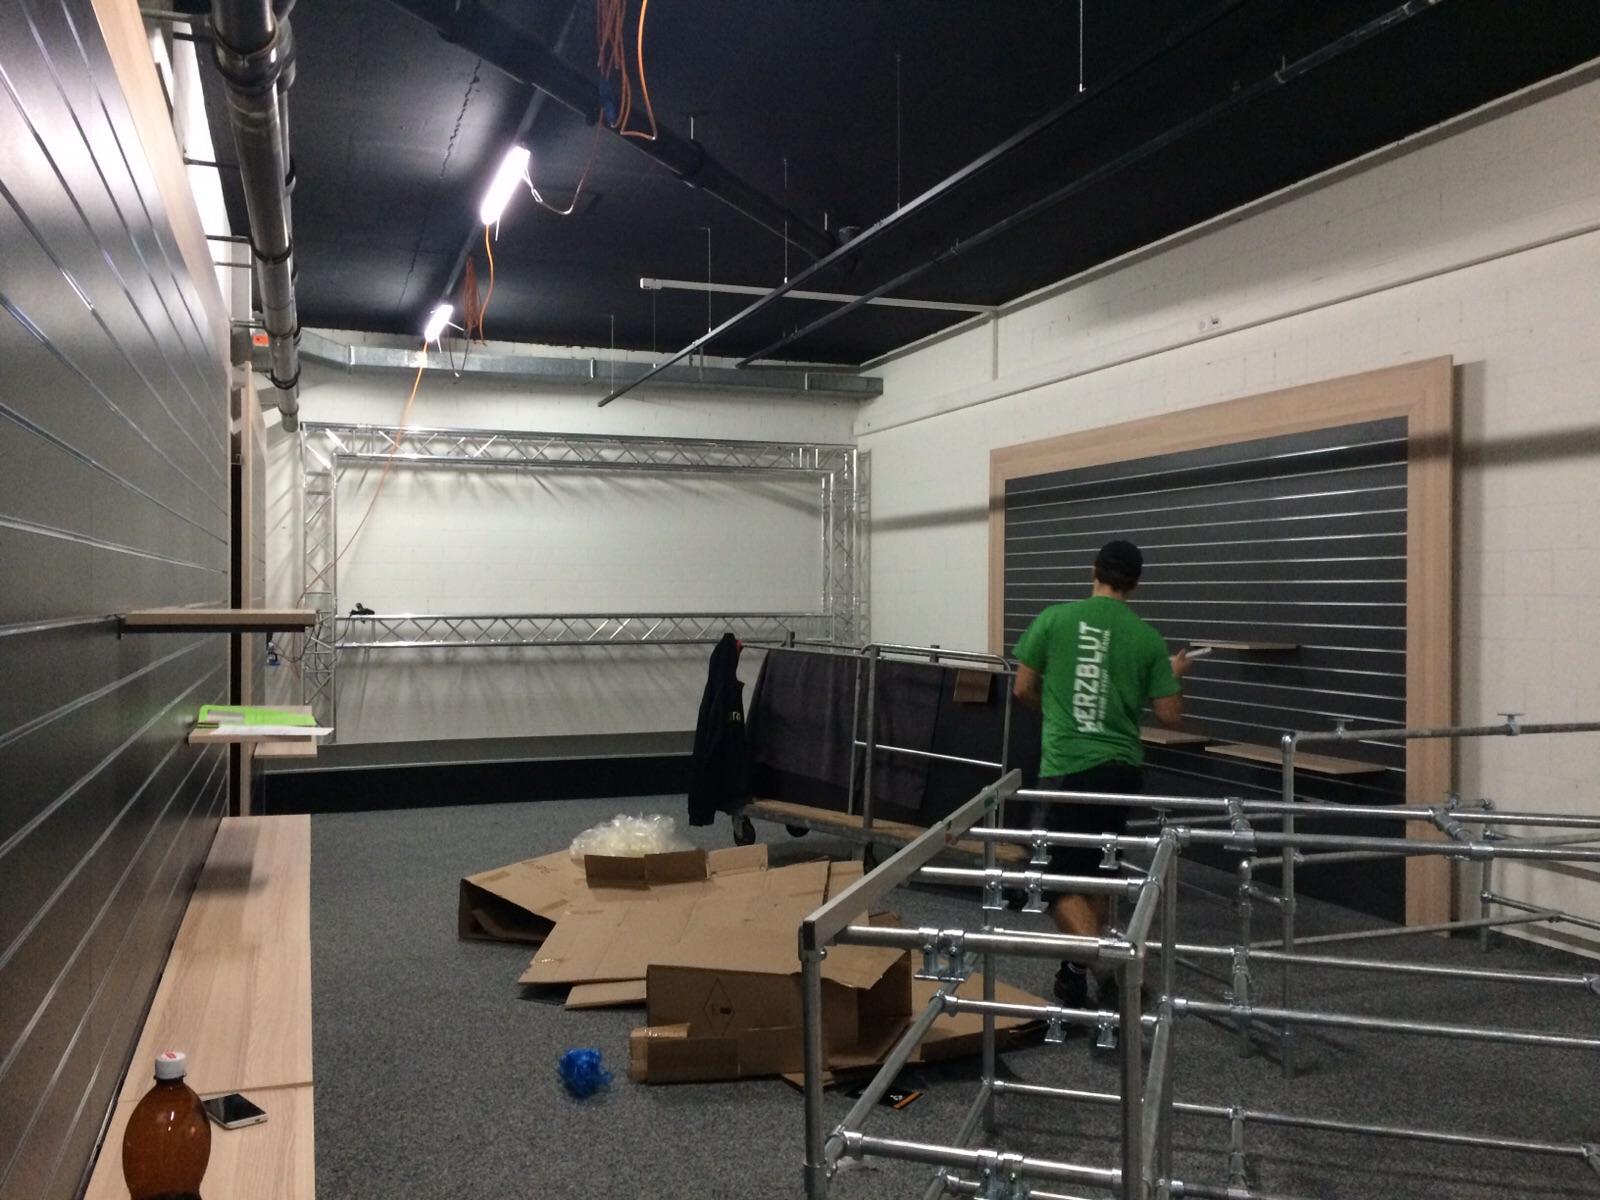 Brack Showroom Baustellenbericht 20150911 (2).JPG